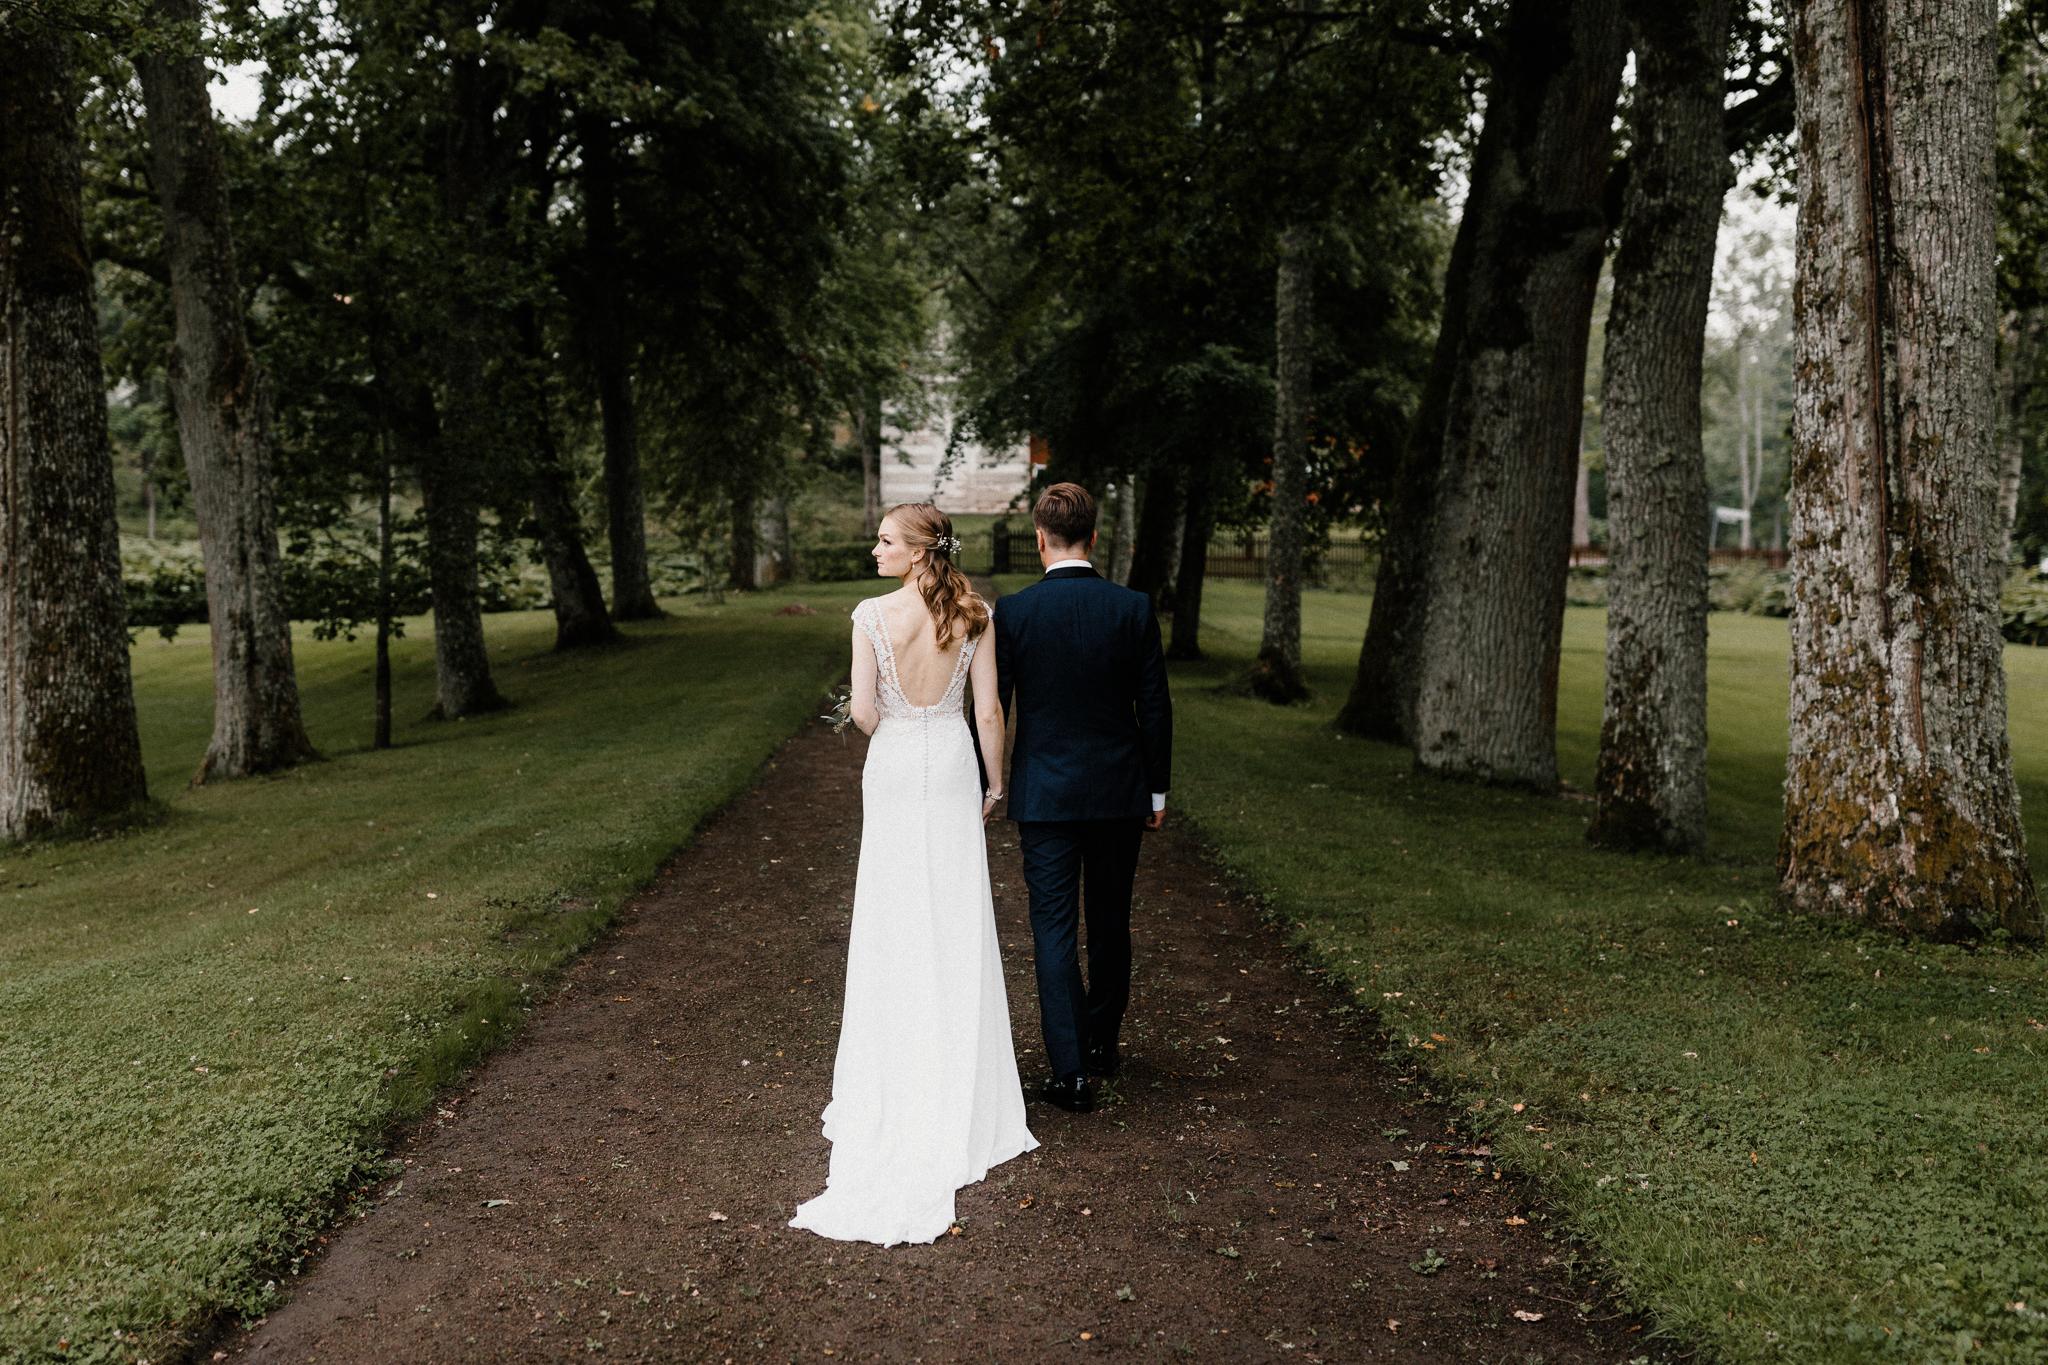 Jessica + Patrick | Fagervik | by Patrick Karkkolainen Wedding Photography-30.jpg